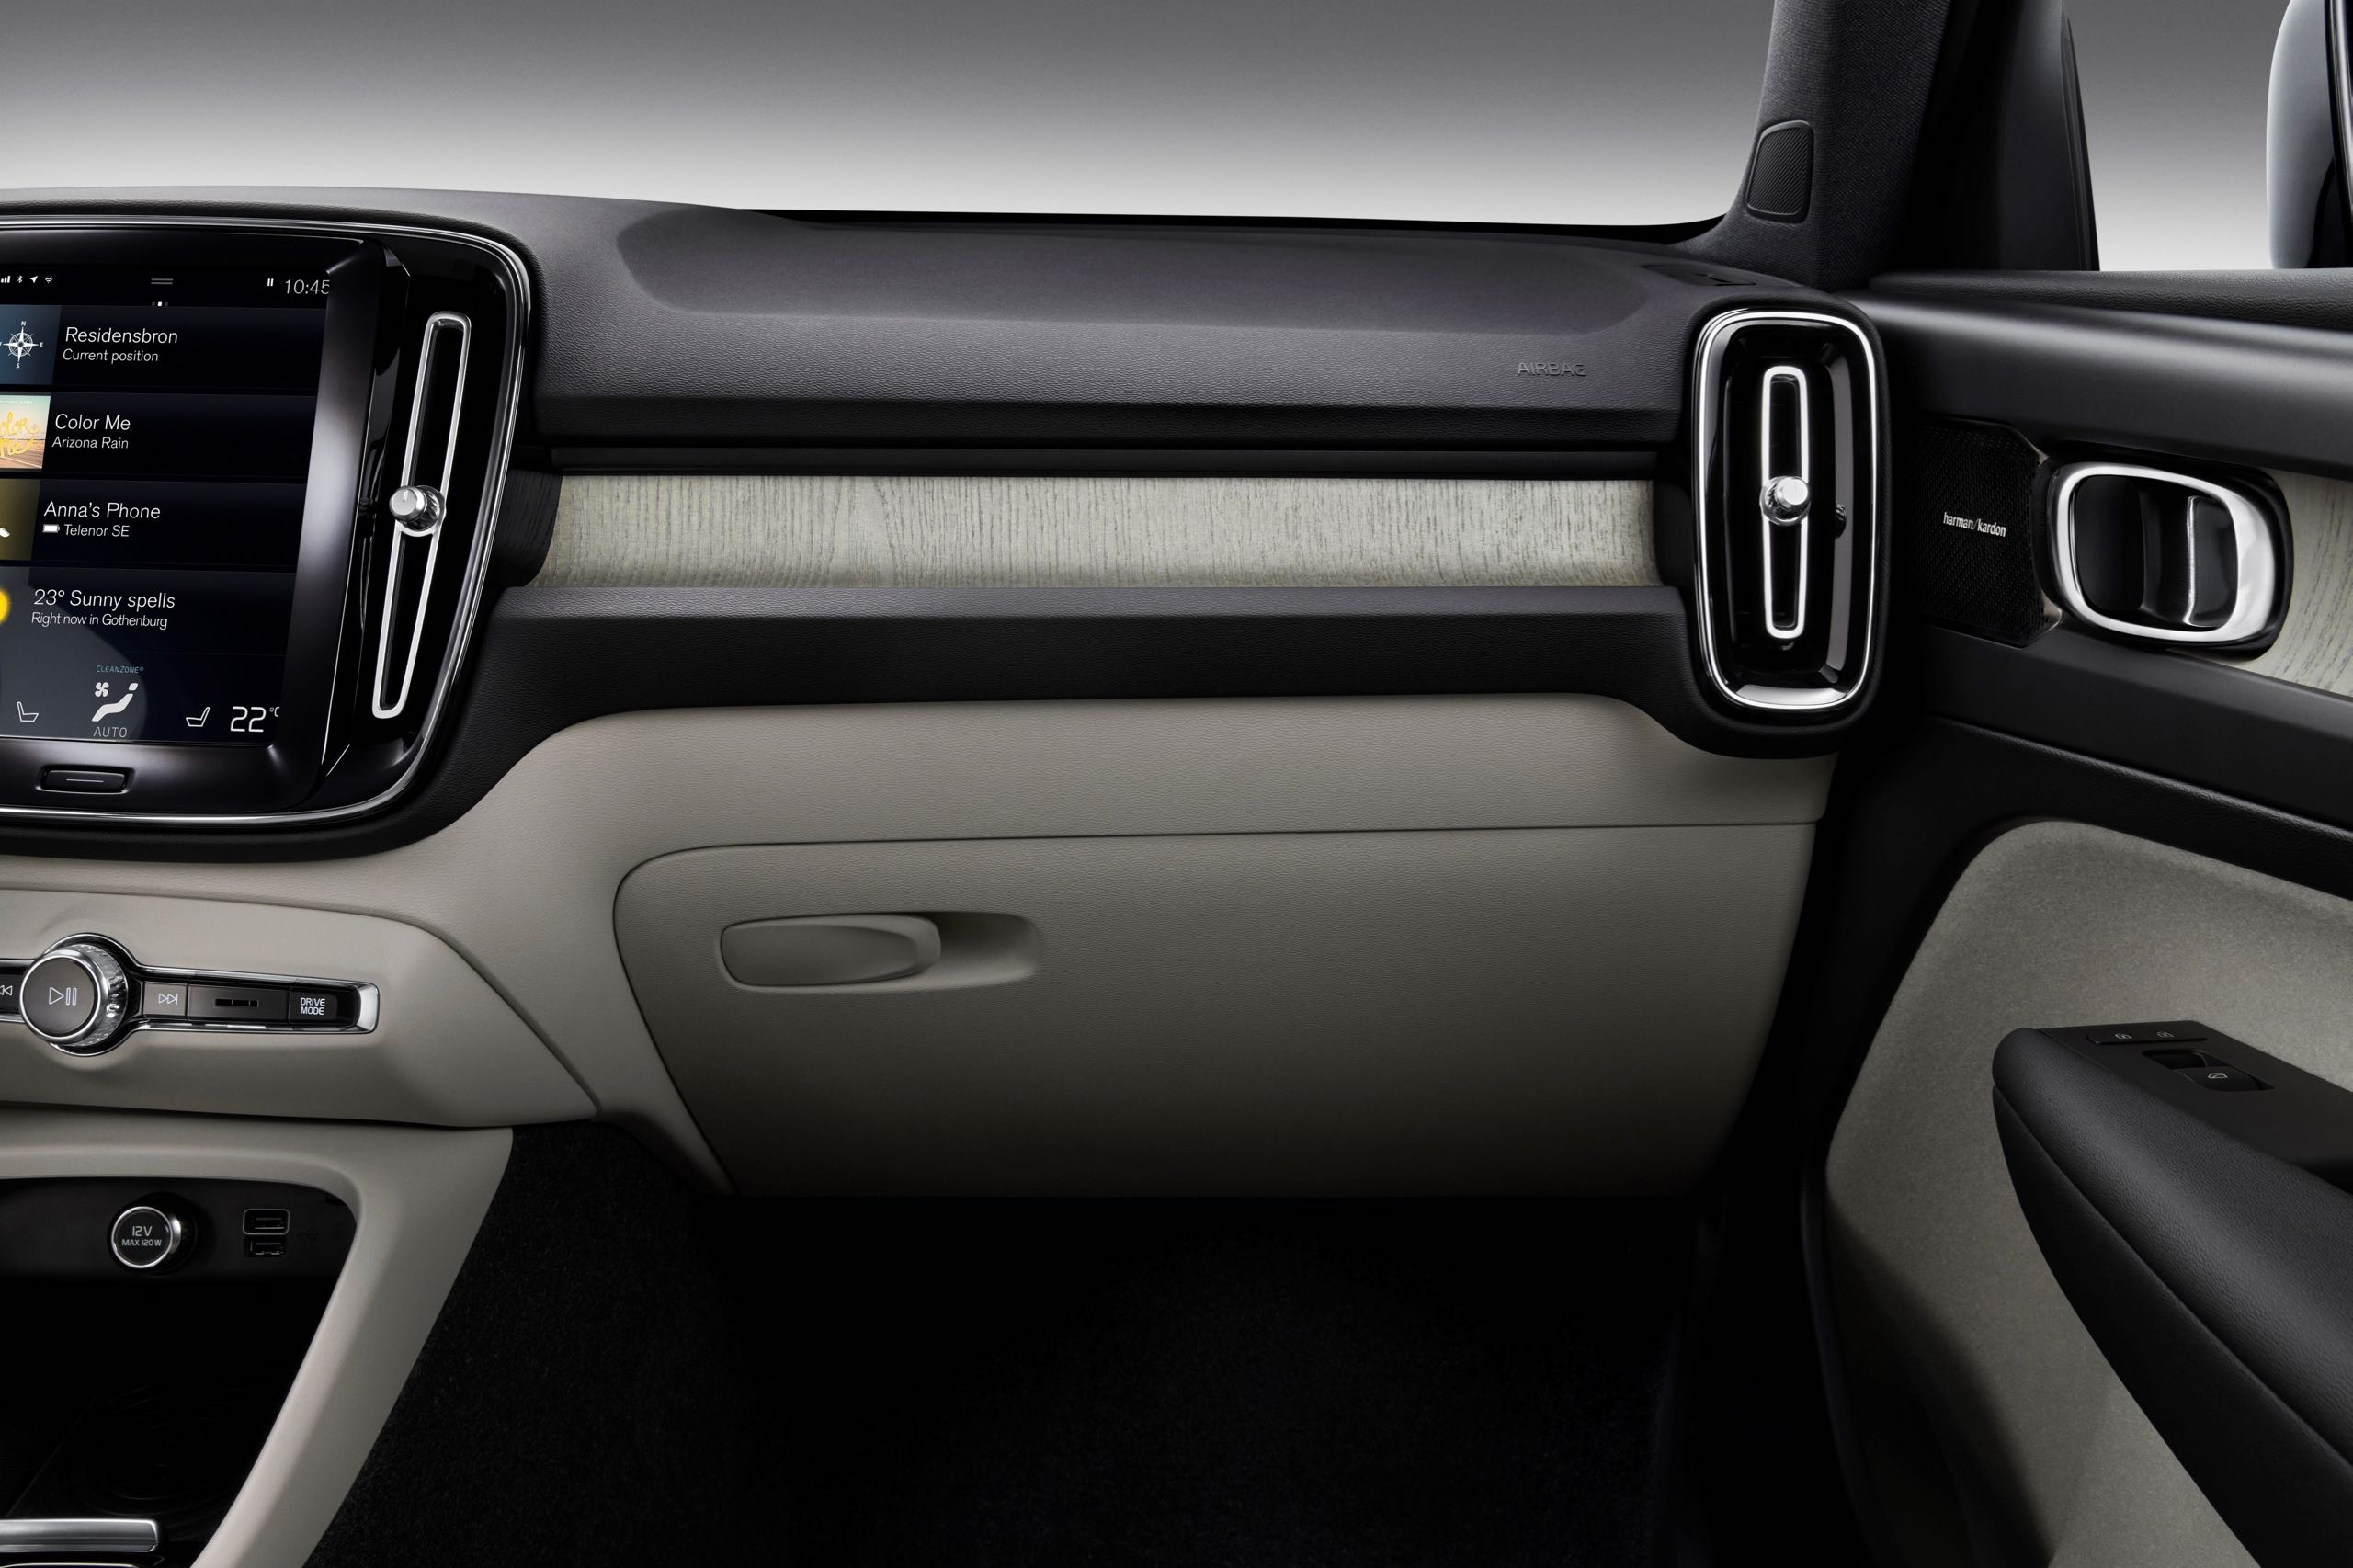 New Volvo XC40 Inscription Interior -  2018, 2018 New XC40, Design, Exterior, Images, New XC40